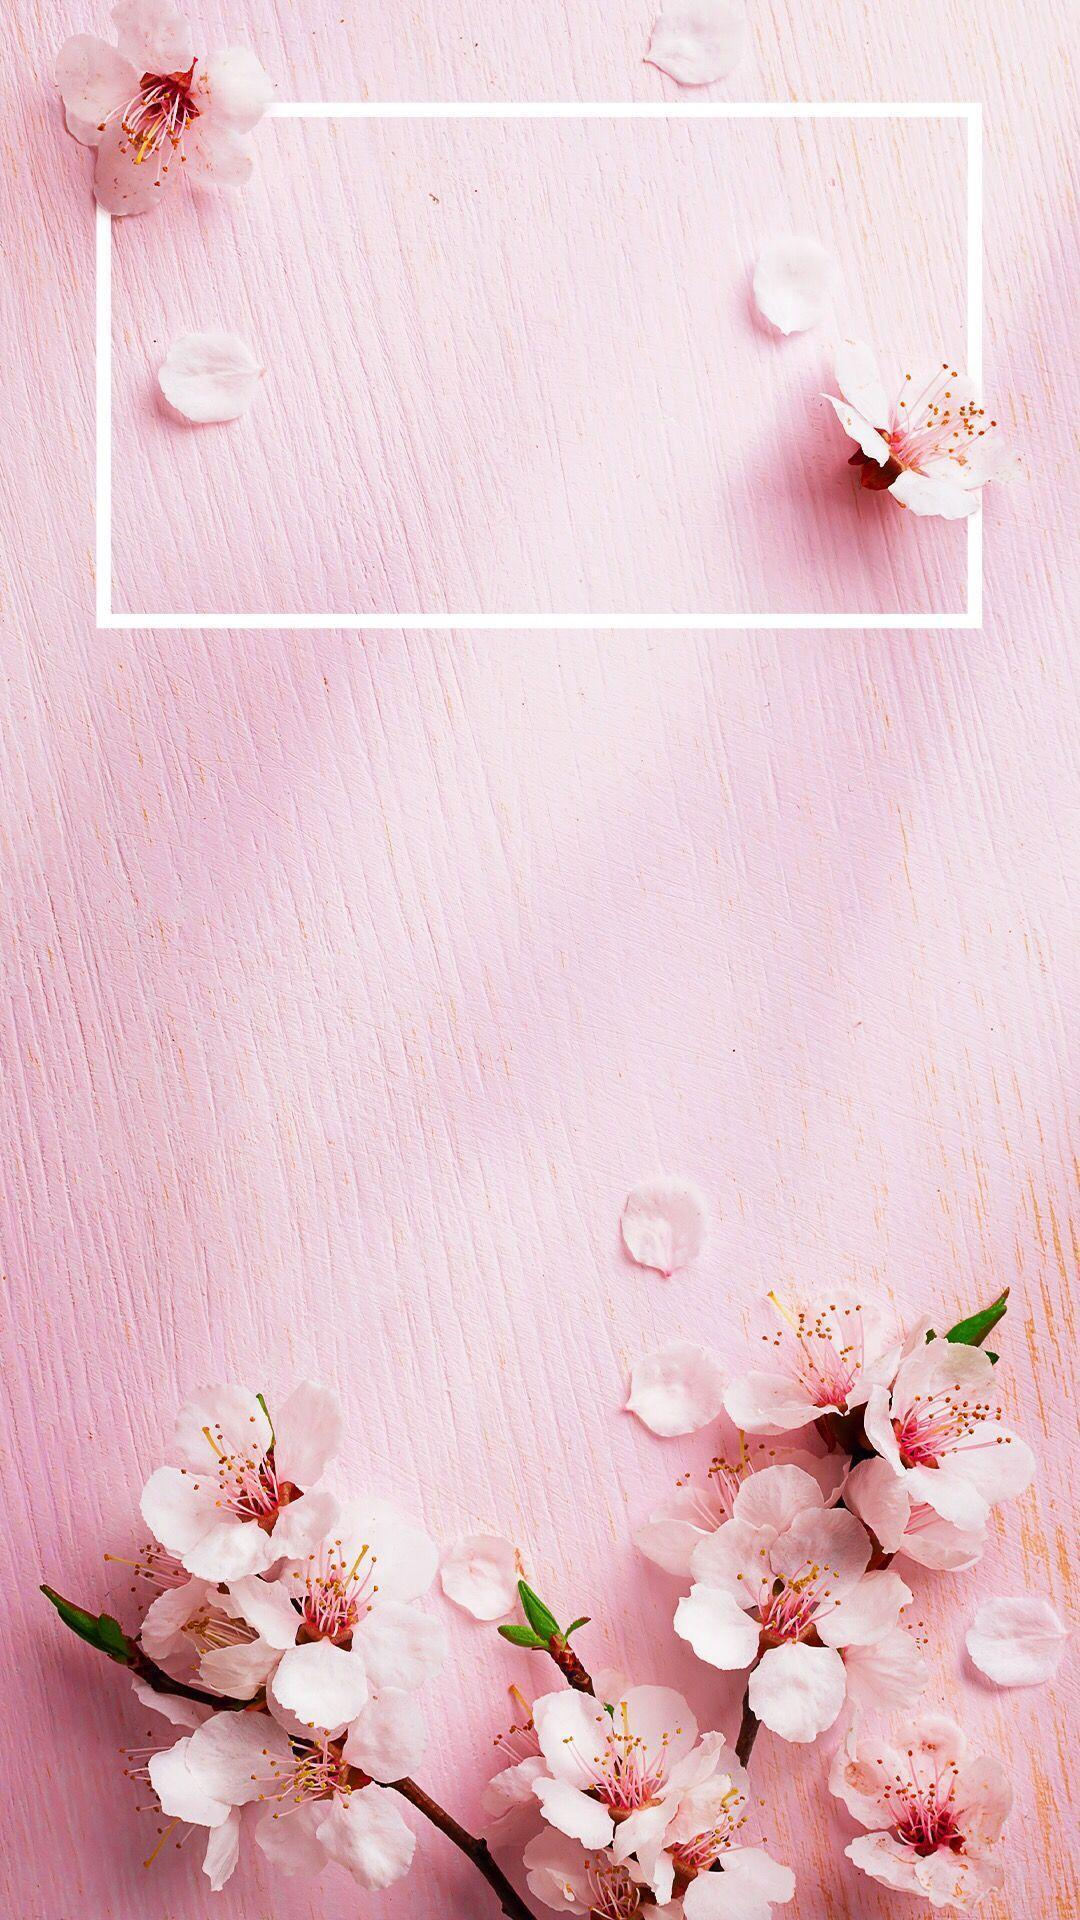 Nice Rose Gold Iphone Aesthetic 10788 Hd Wallpaper